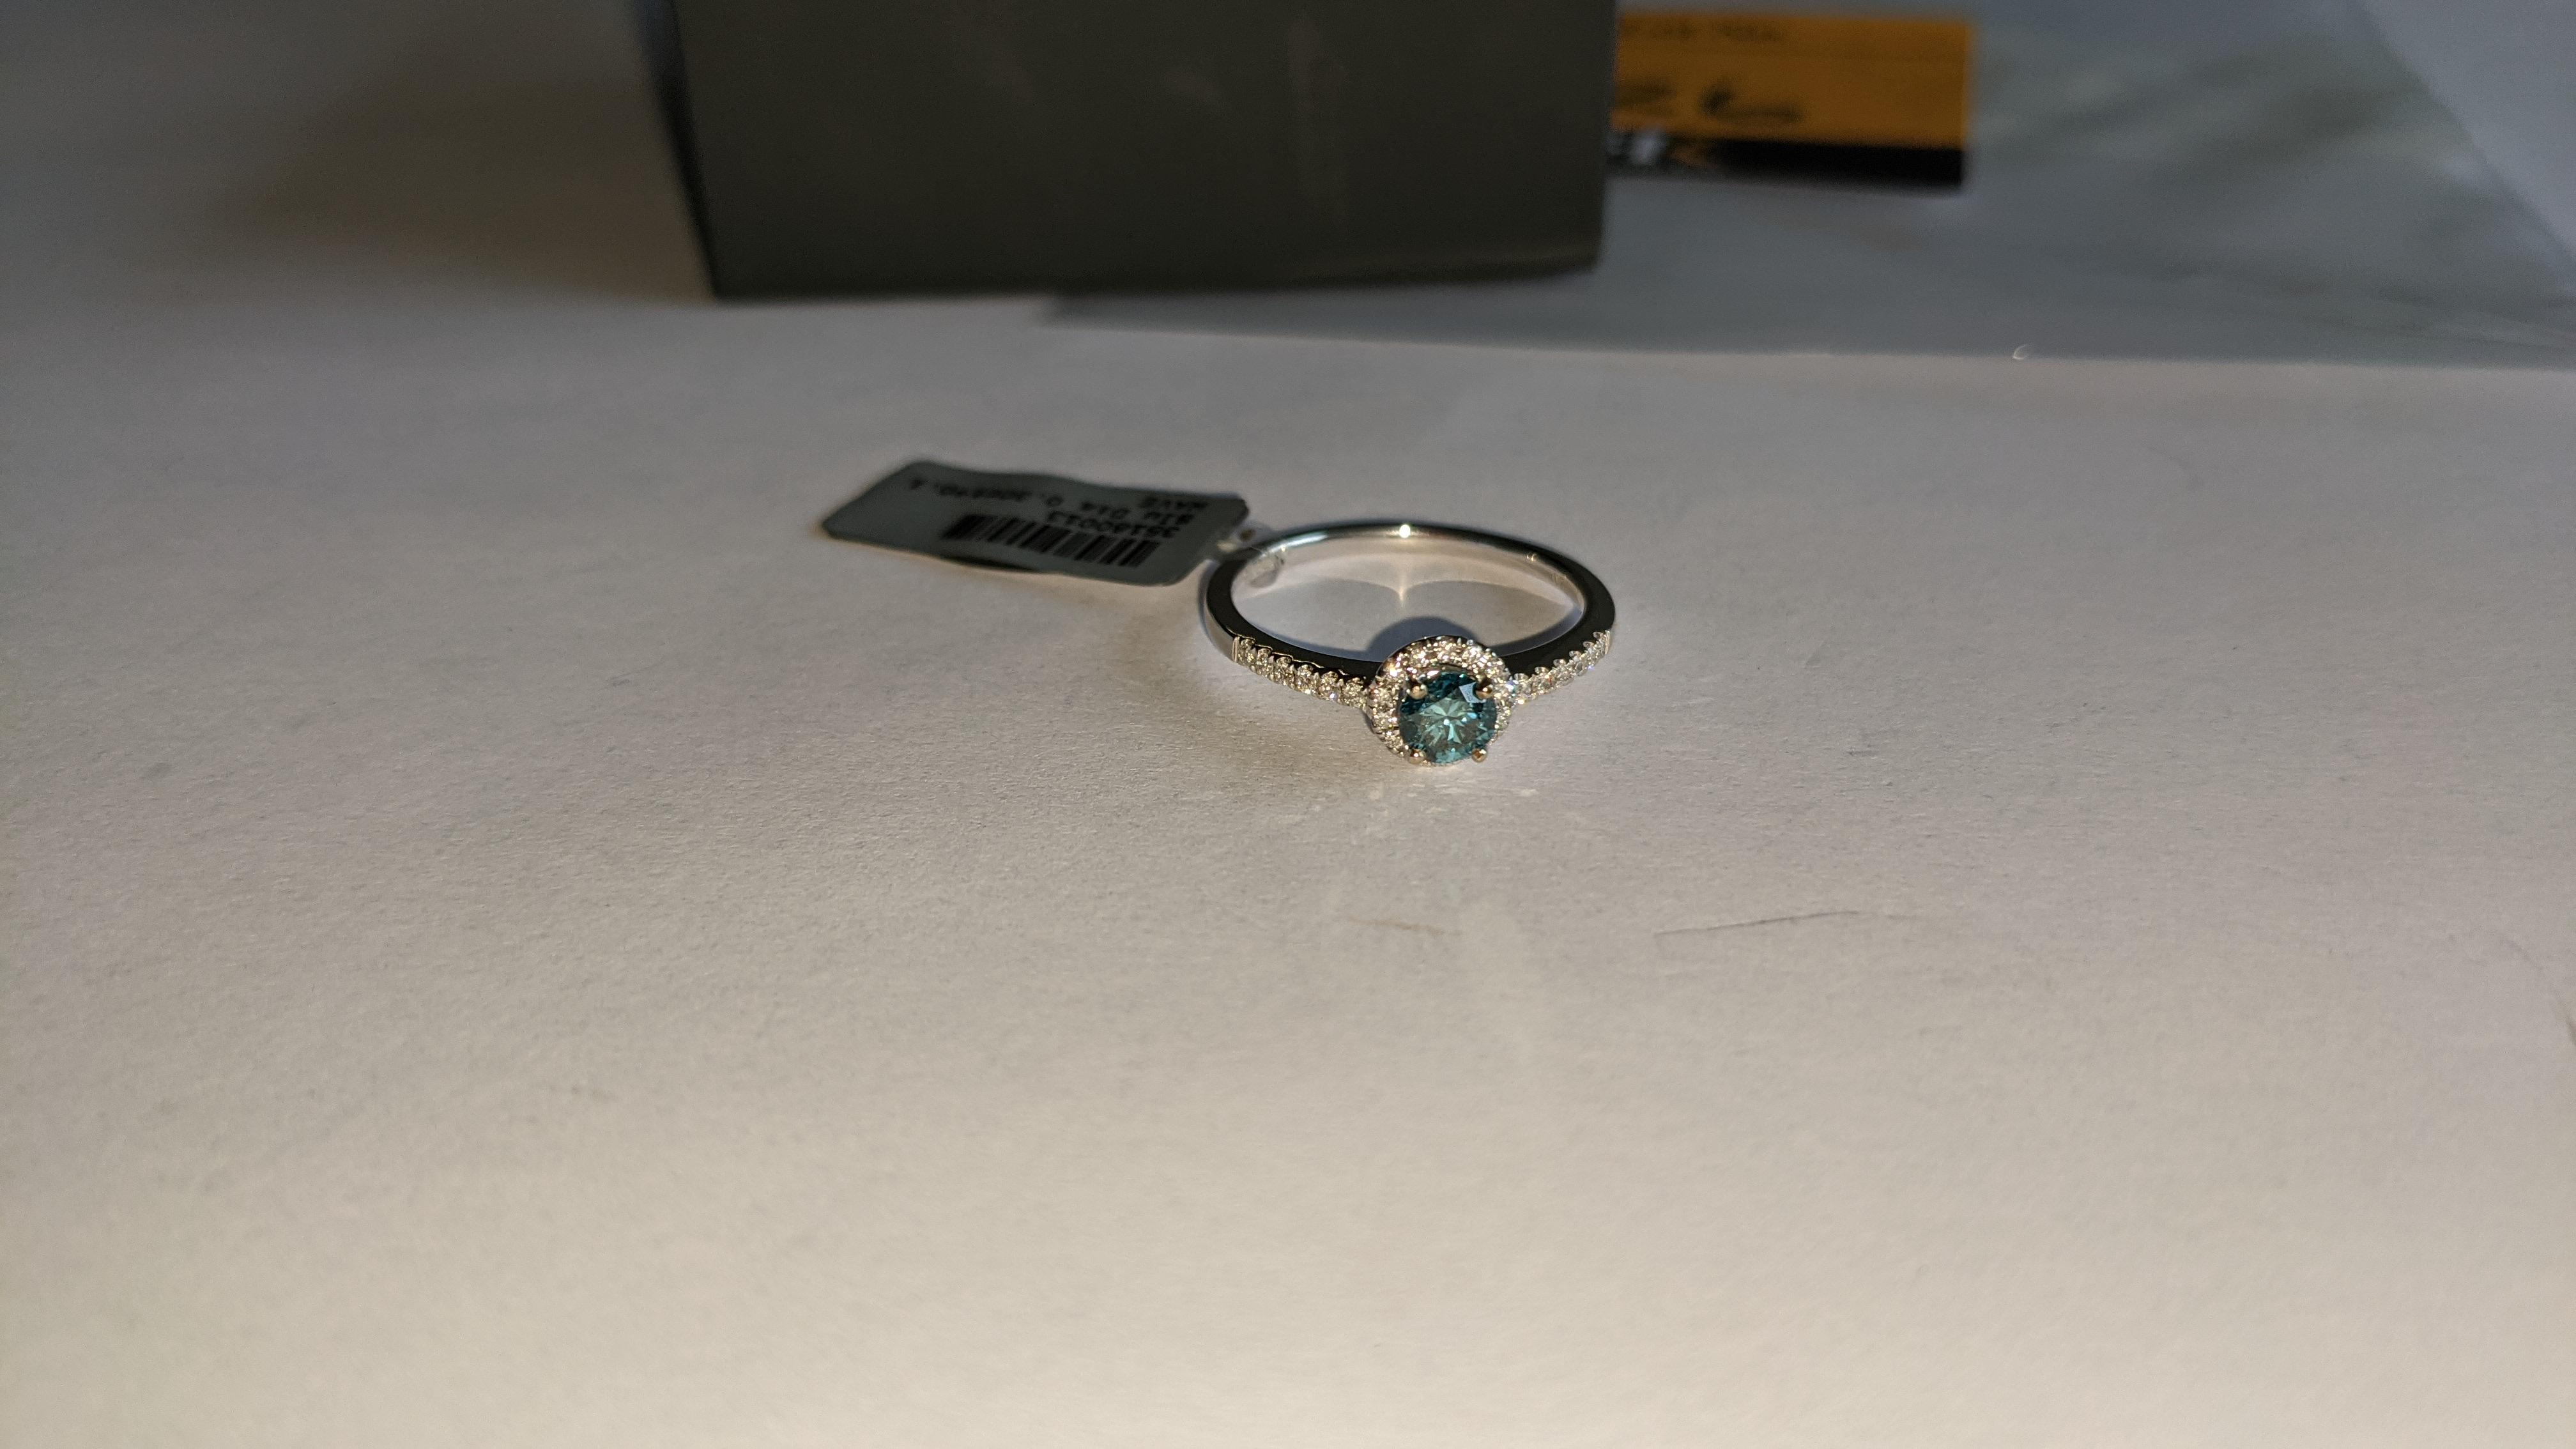 18ct white gold & diamond ring with 0.30ct blue diamond & 0.1ct of additional diamonds around the ce - Image 9 of 19